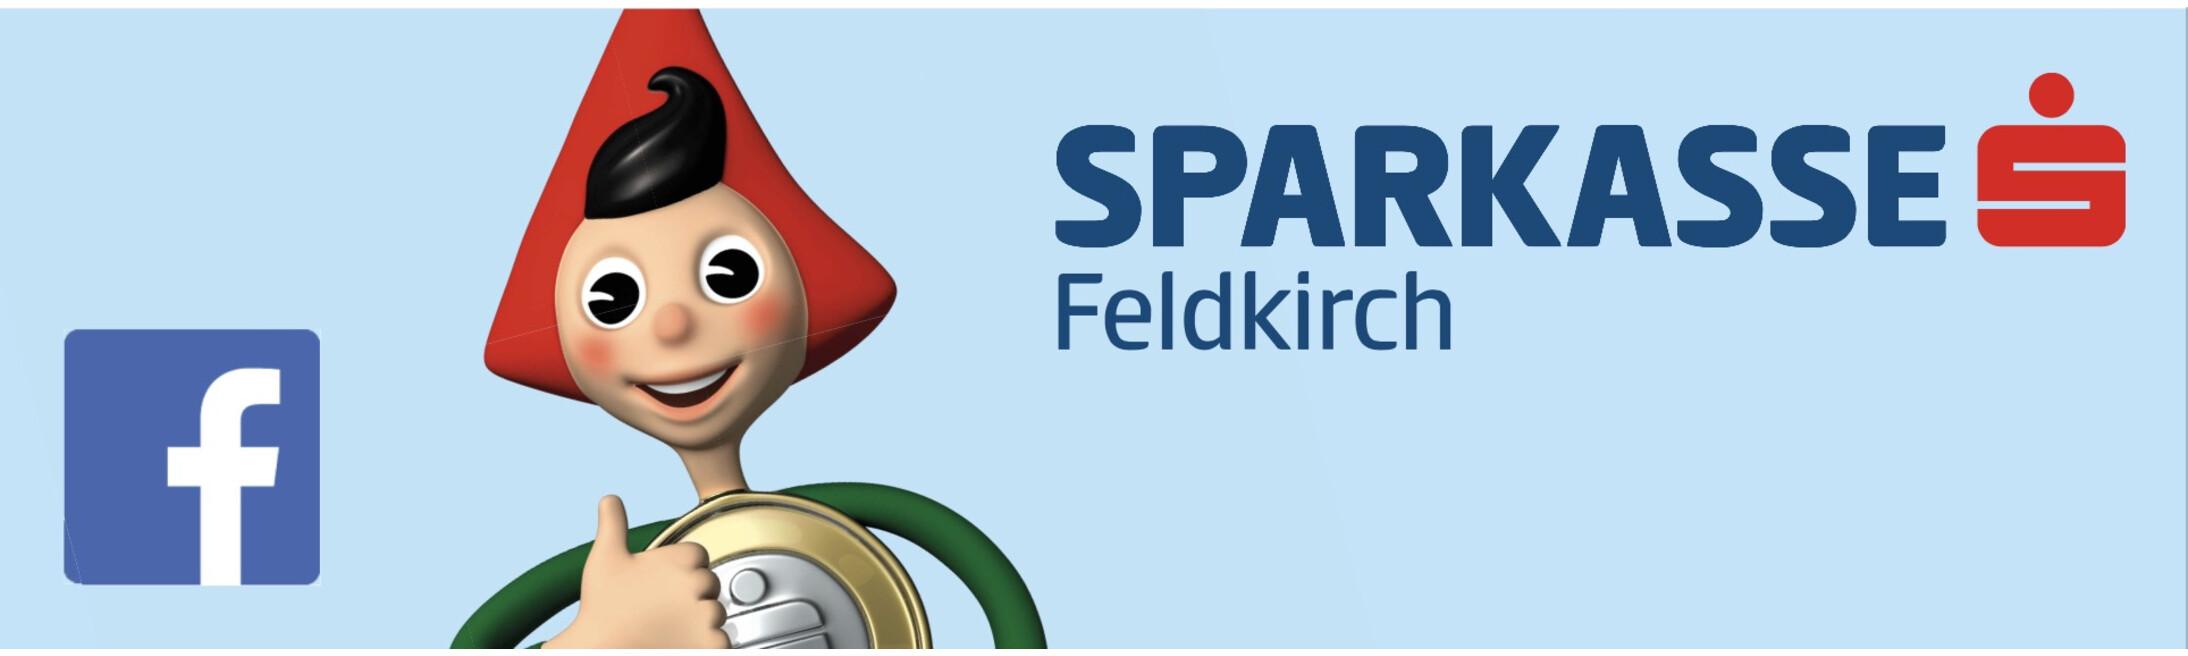 sparkasse logo app.JPG